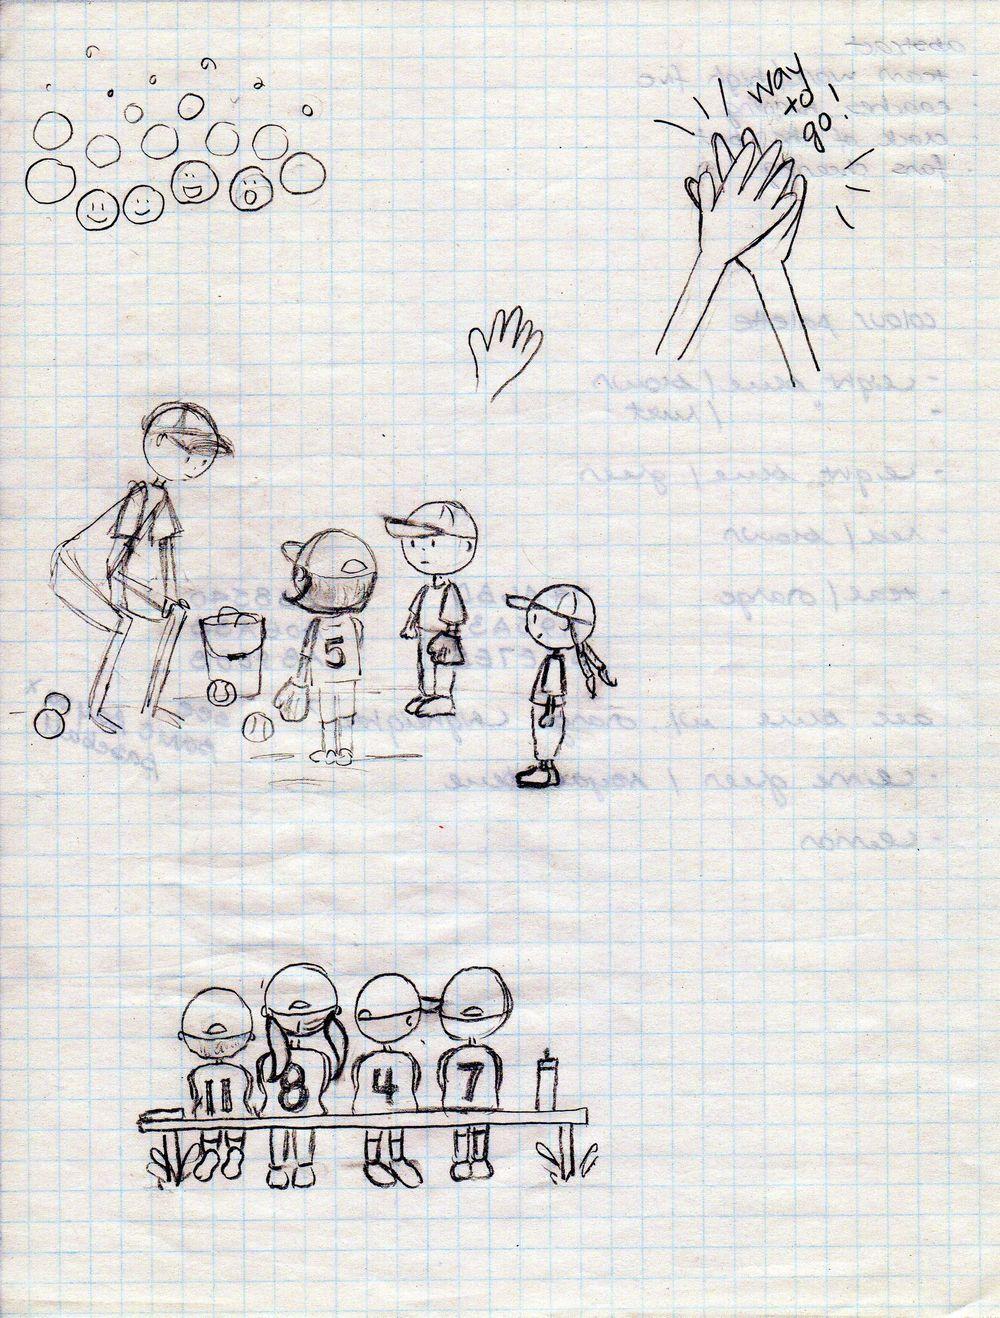 Andrea's baseball spot illustrations - image 2 - student project